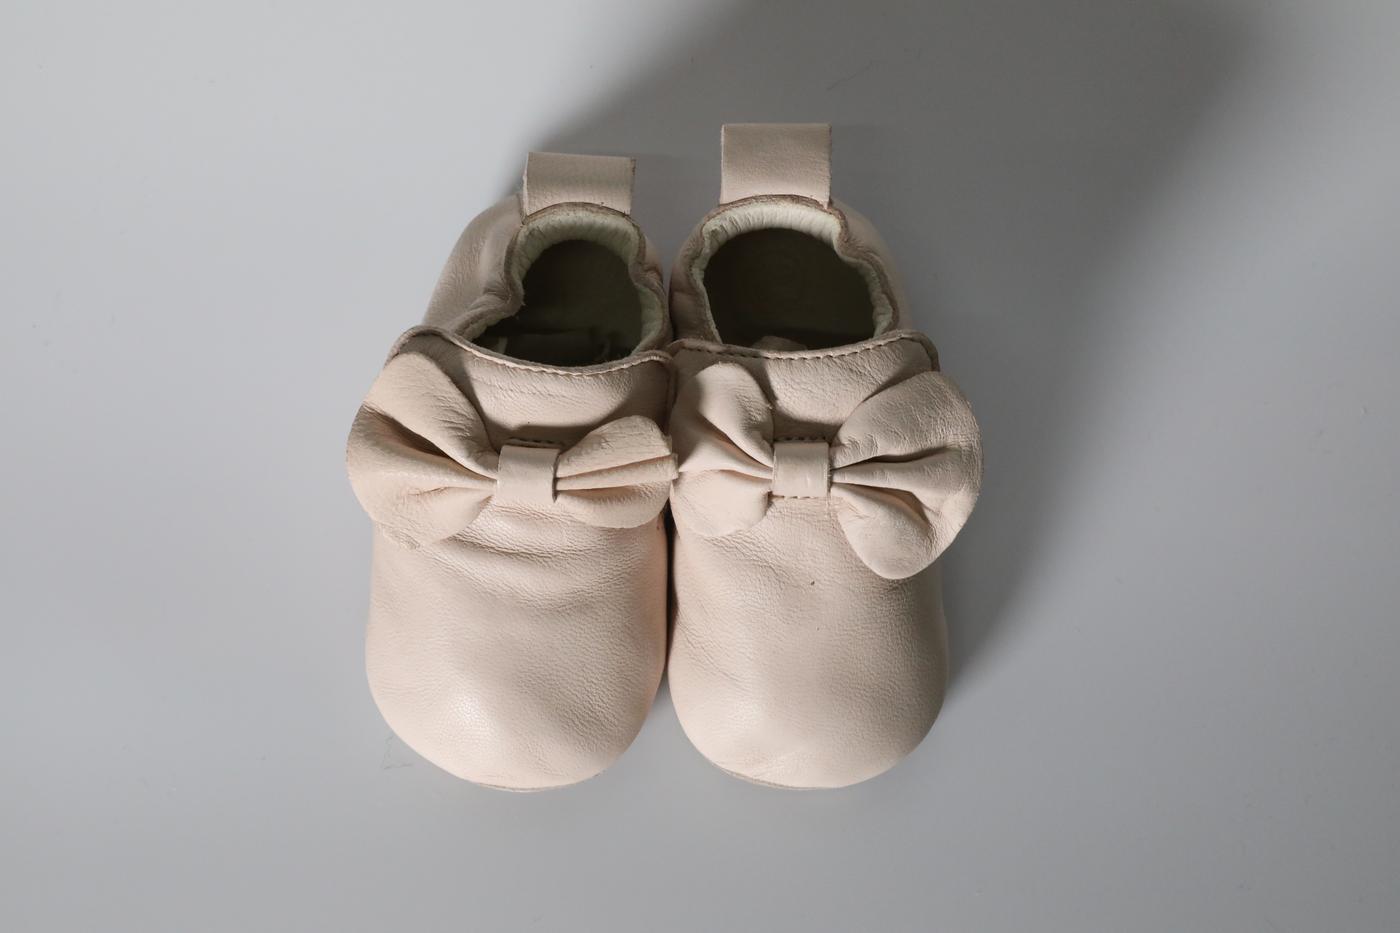 Comfy Cream infant shoes